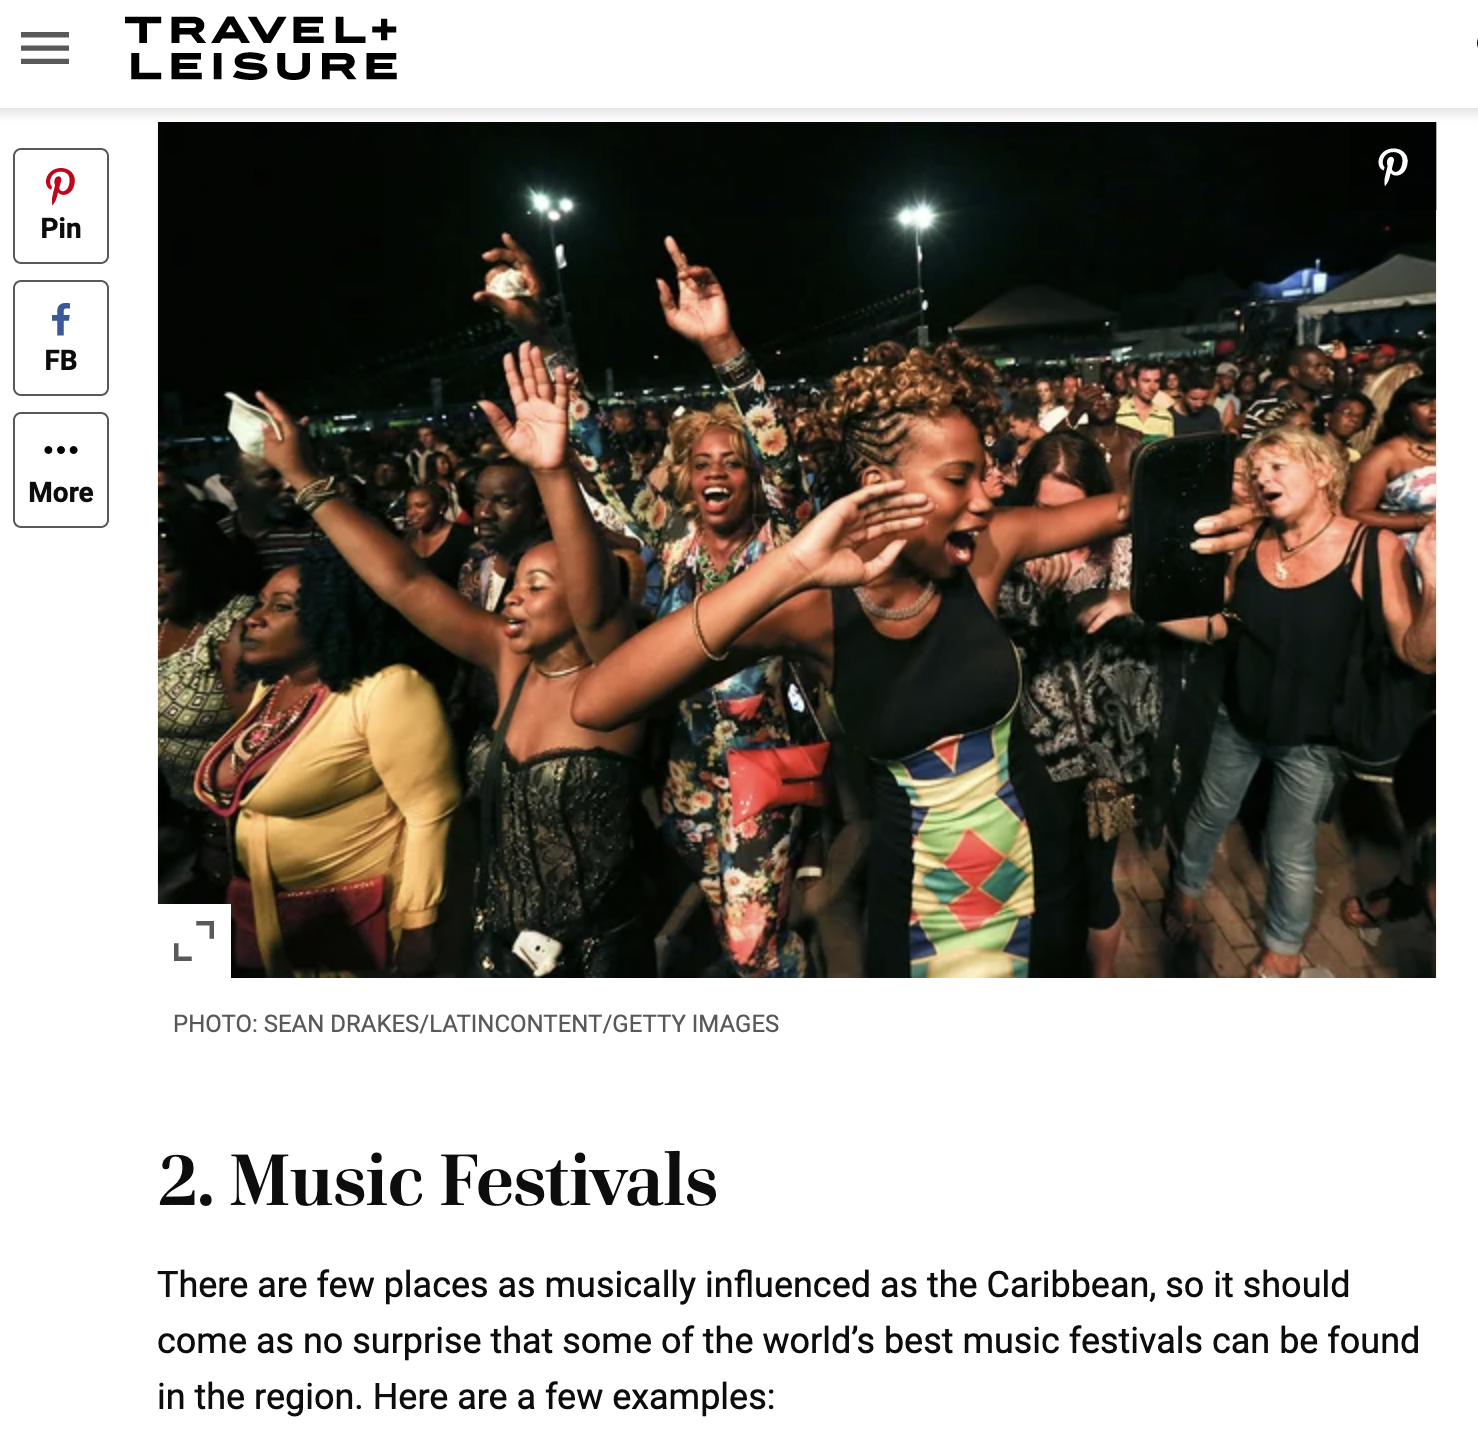 Travel-St Maarten-Tourism-Music-Festival-Sean-Drakes